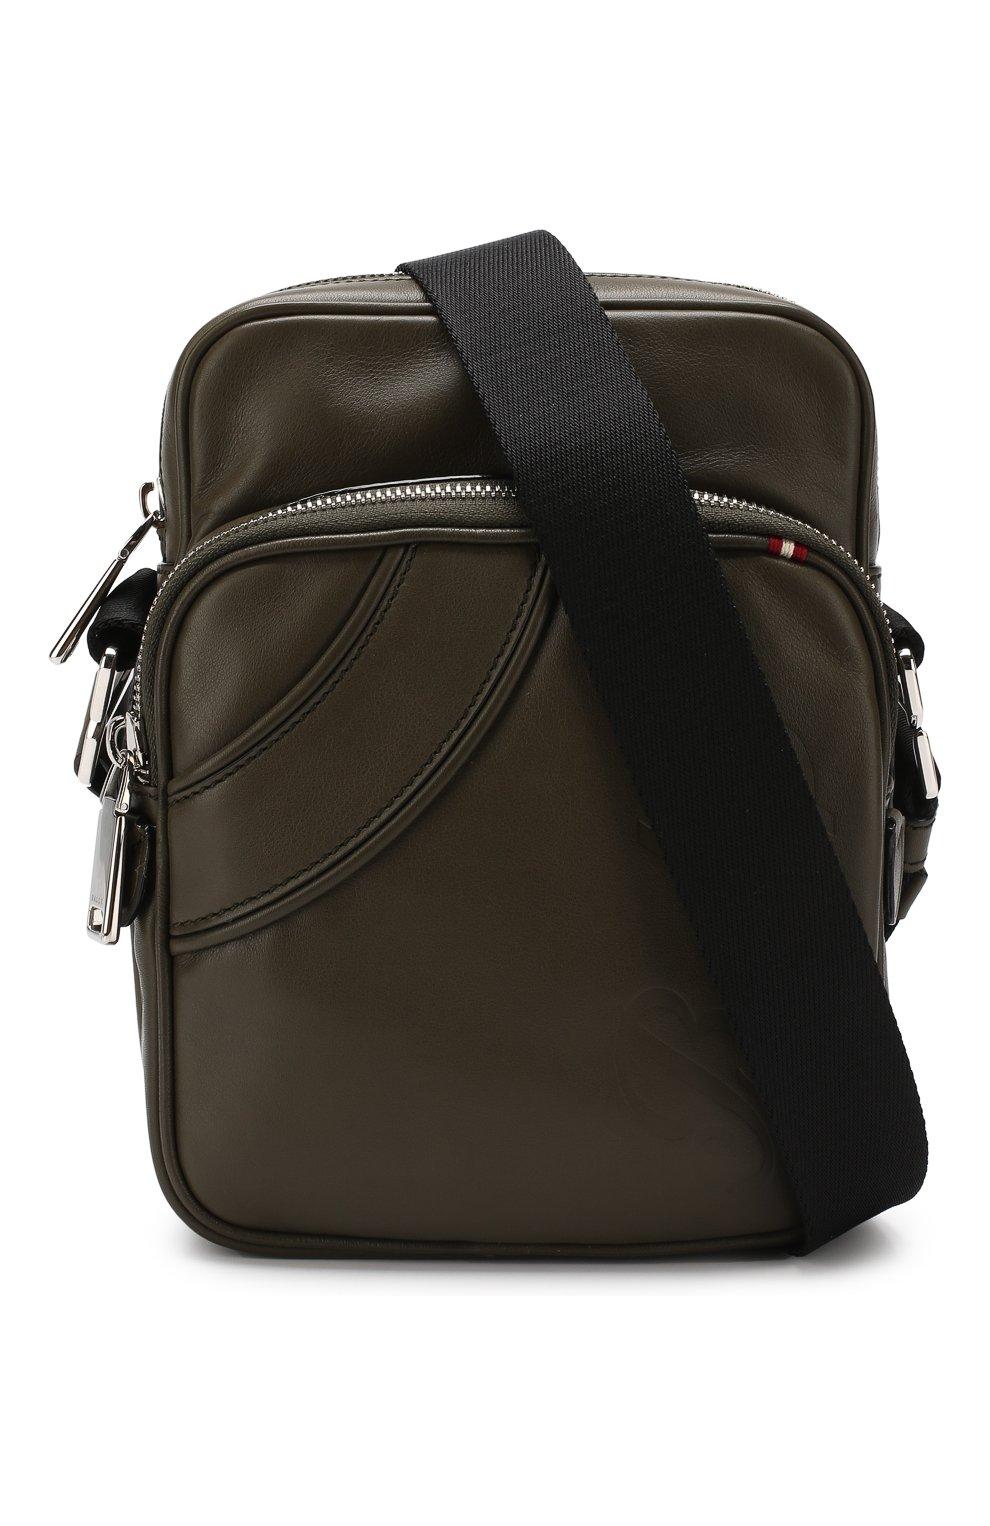 bdba8516a16e Мужская хаки кожаная сумка-планшет ace BALLY — купить за 42300 руб ...